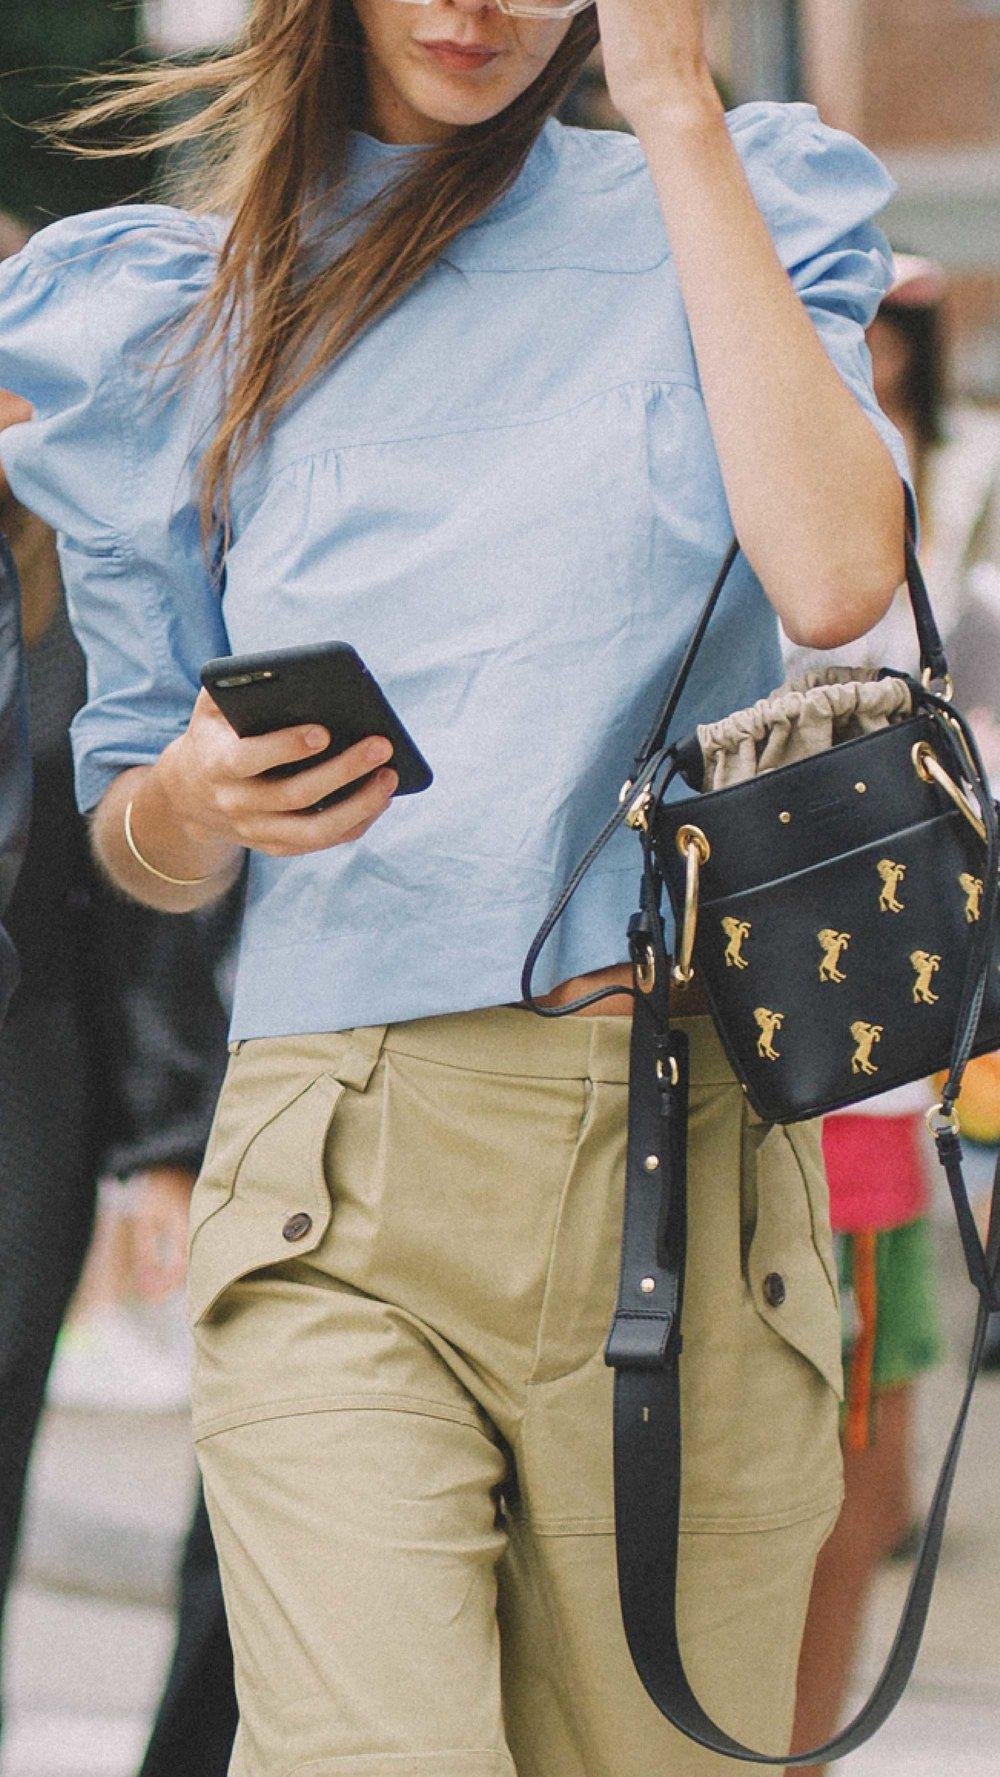 12 Best Chloe bags of Fashion Week -  CHLOe Roy mini leather bucket bag and Chloe Small Tess Leather Shoulder Bag12.jpg